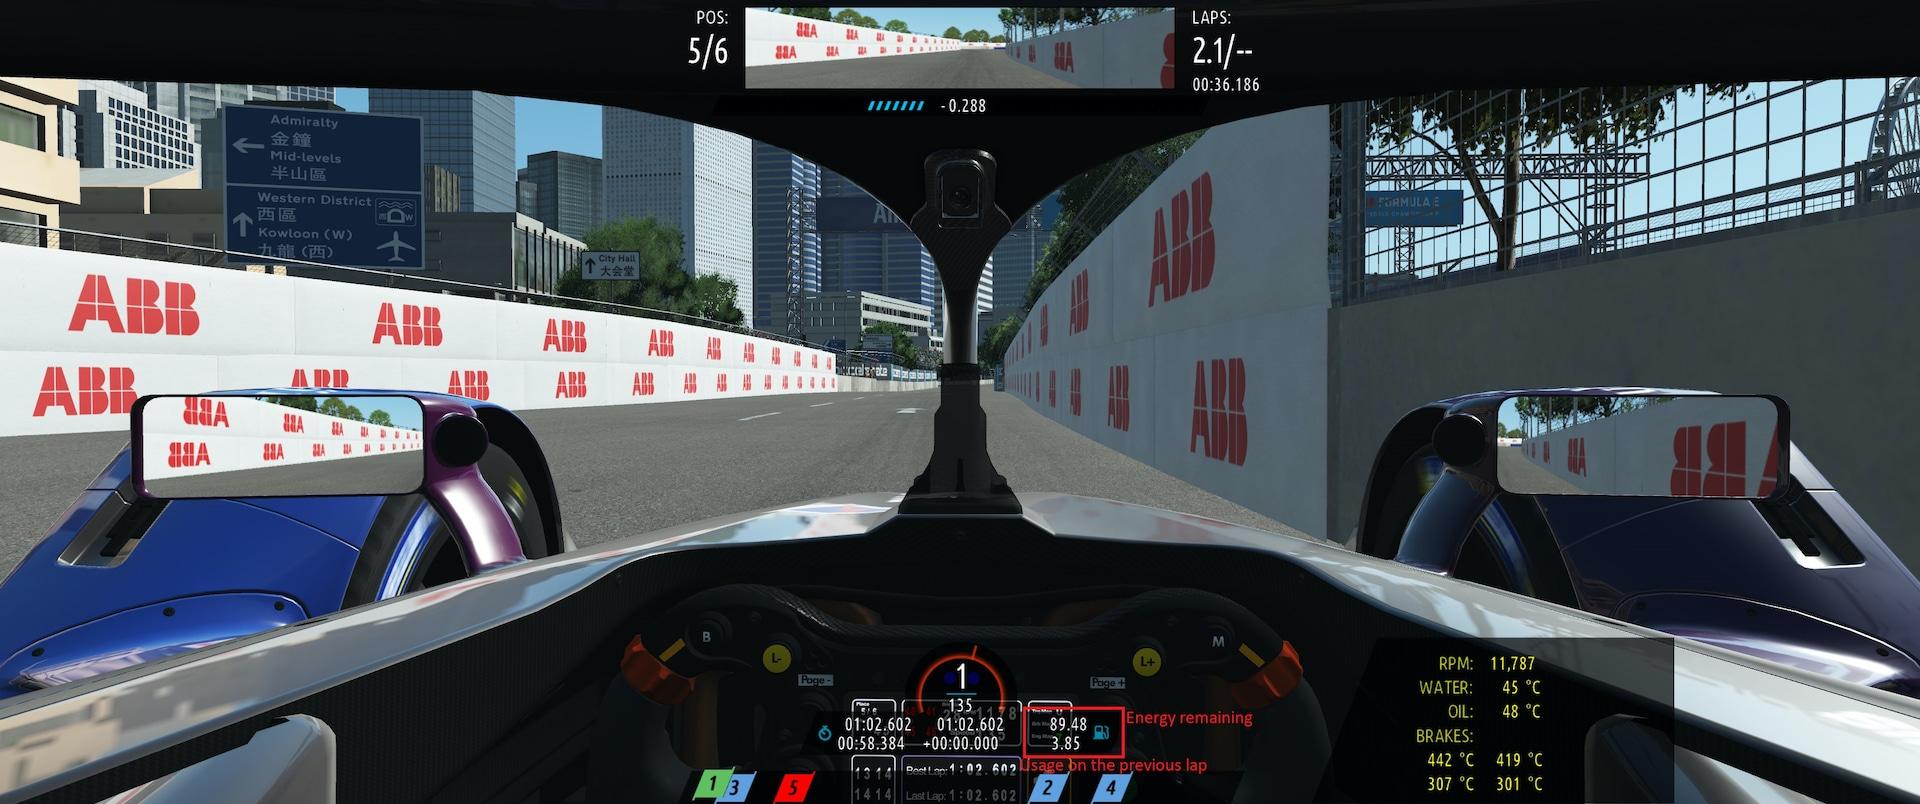 BMW-Formel-E-Virtuell-Rennen-Cockpit